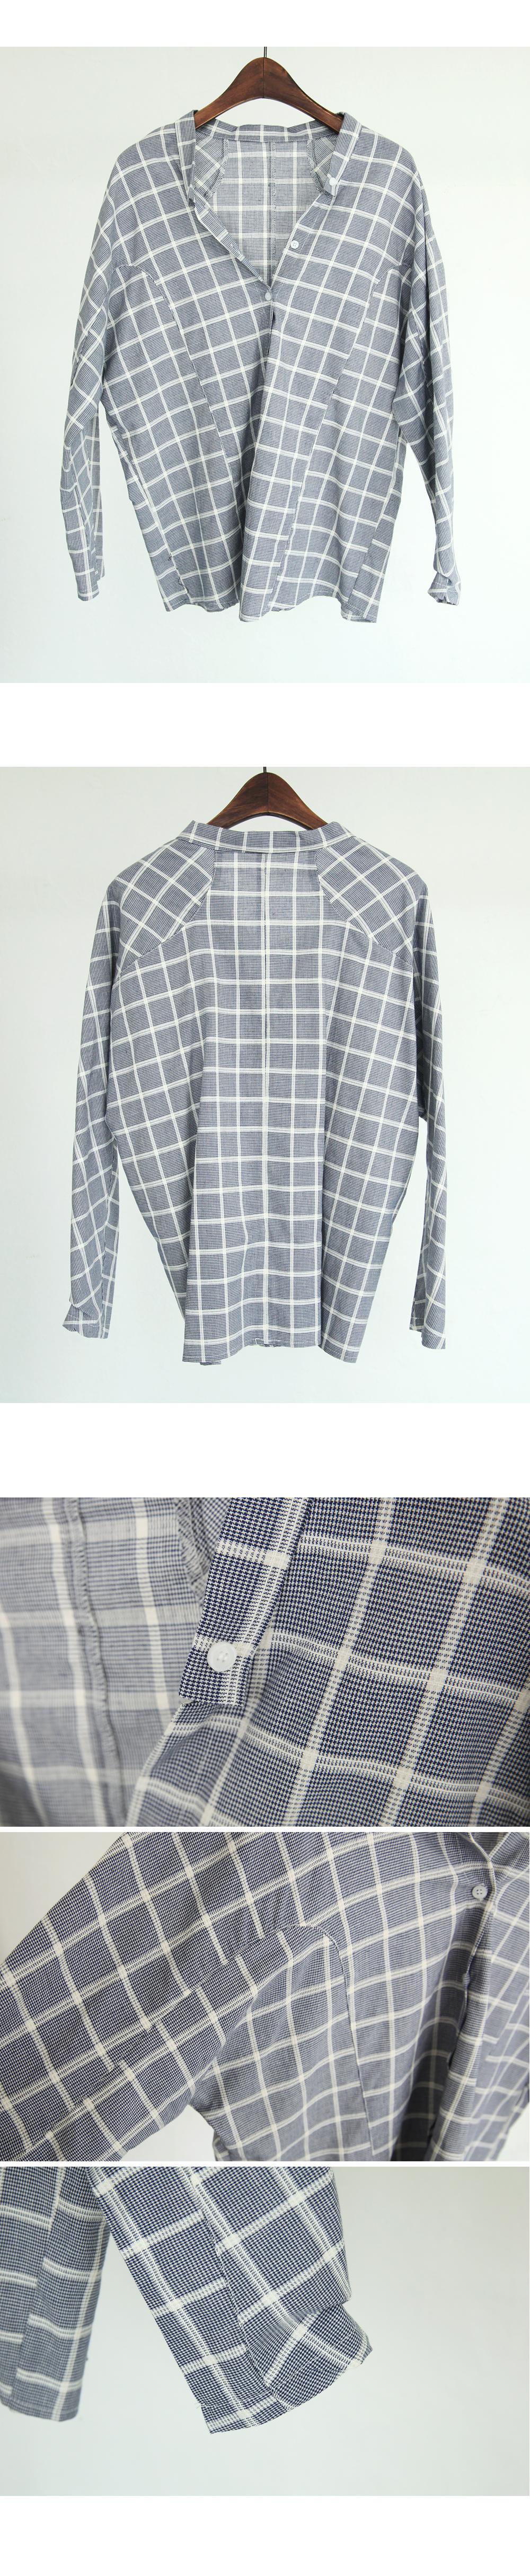 Mandarin Patterned Button Down Shirt - BLACKFIT: Shop Korean clothing, bags, shoes and acc. for women